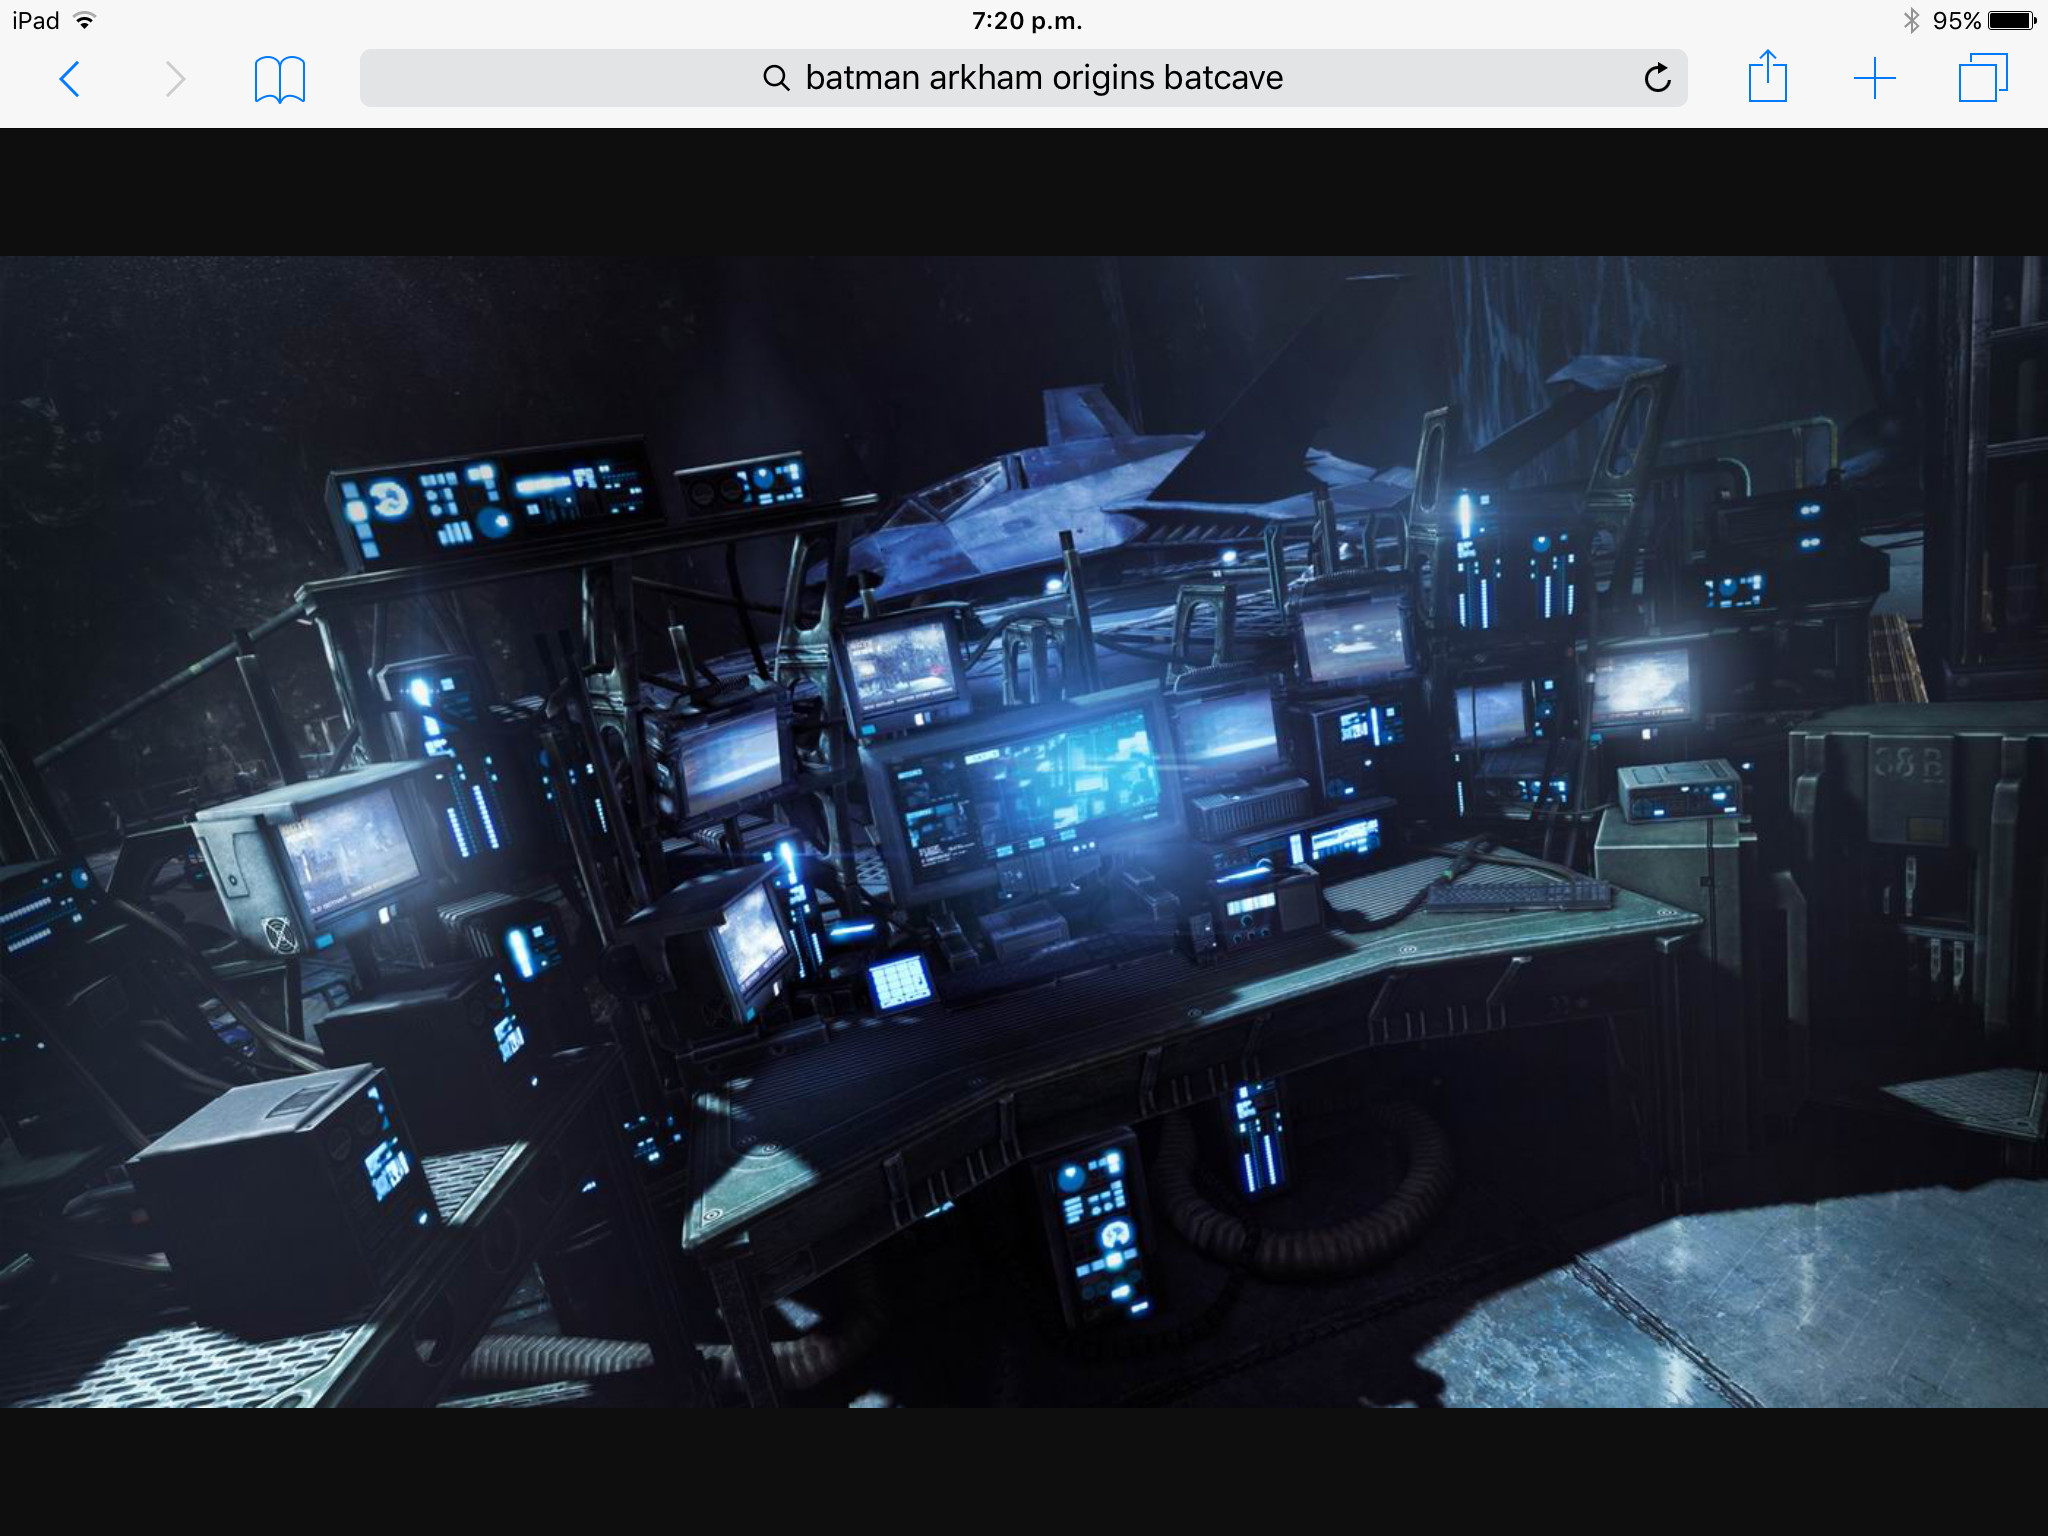 https://img2.wikia.nocookie.net/__cb20130928174435/batman/images/c/c7/Bao_batcomputer_batcave.jpg  | Bat caves, secret lairs, and super hero hideouts …